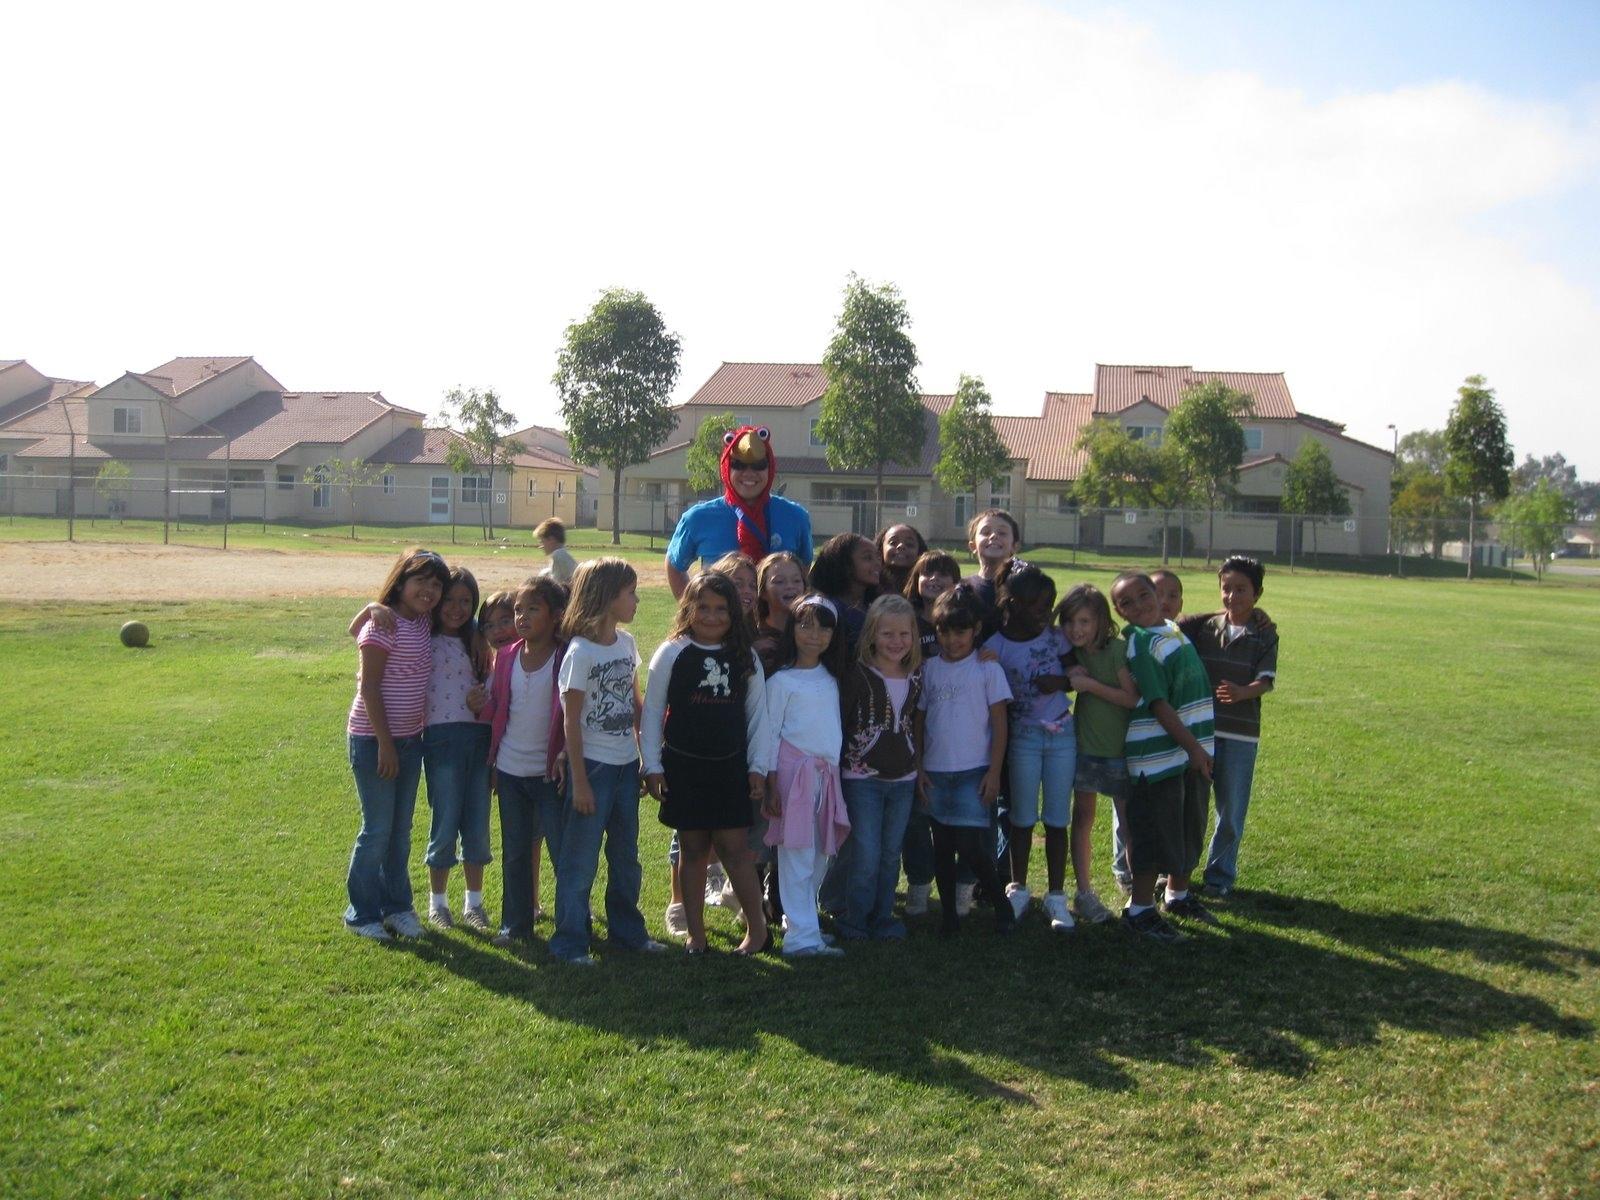 Jon Pham at Elementary school